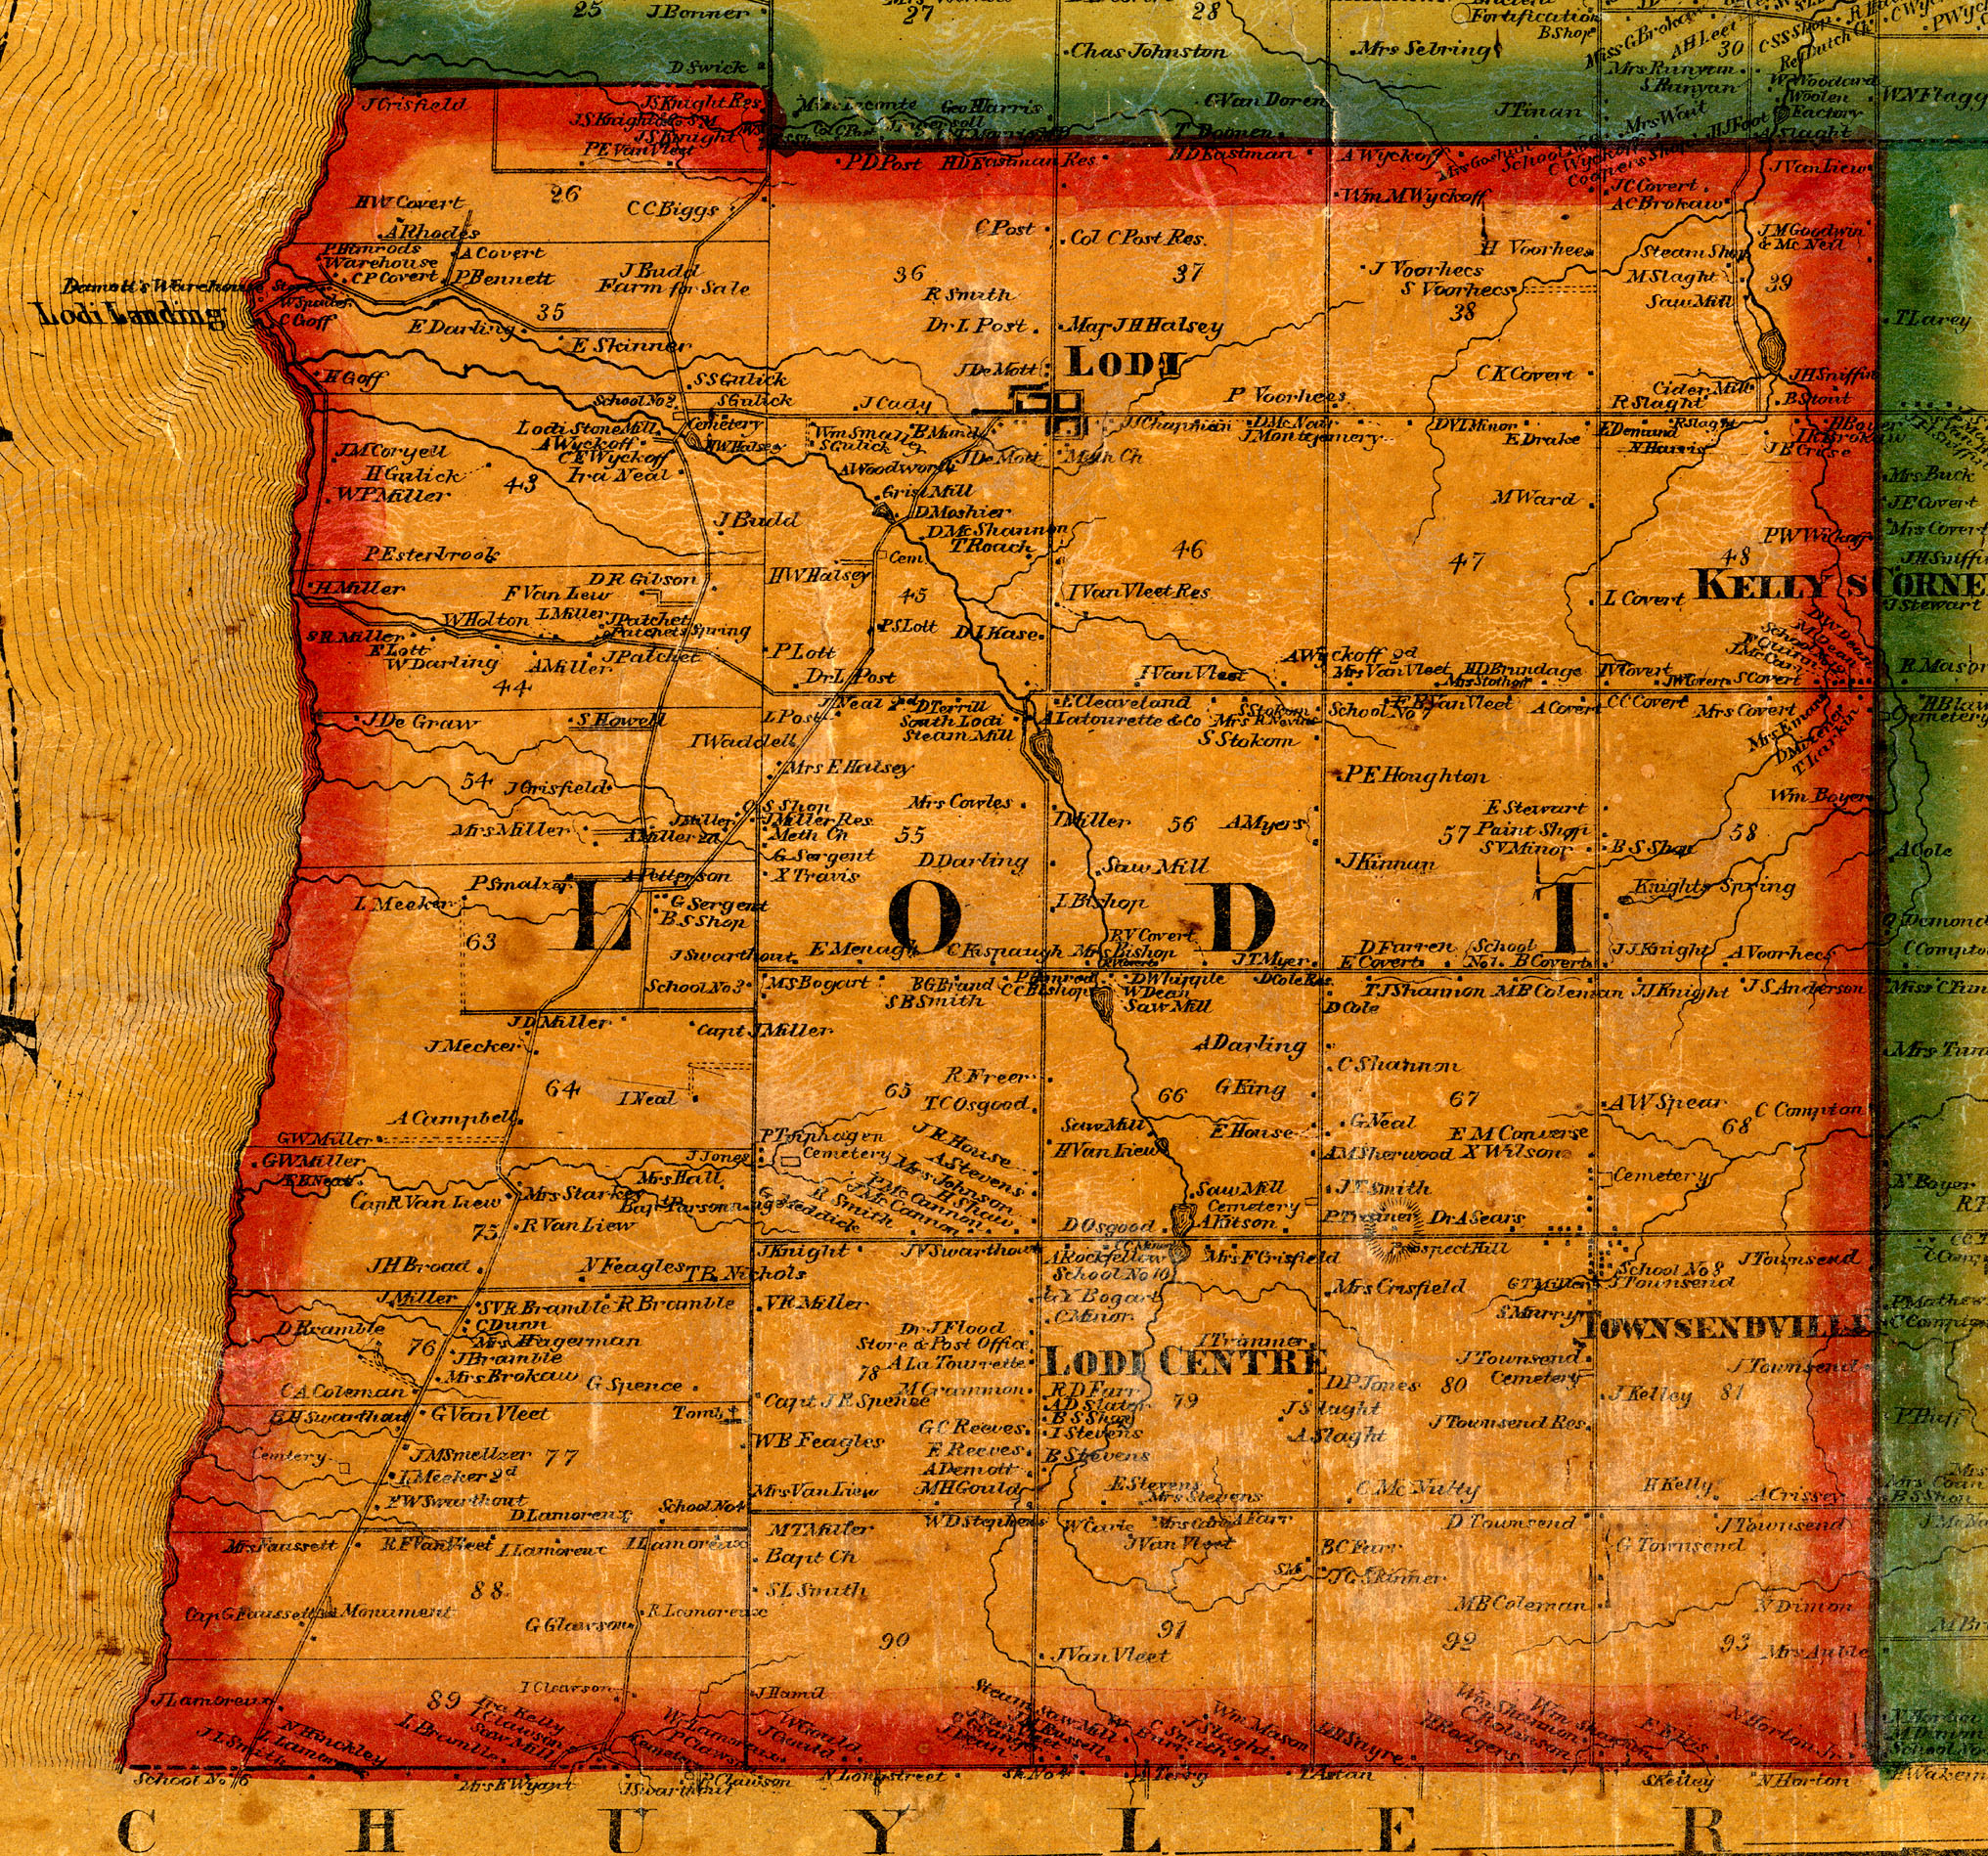 1859 Cayuga/Seneca County, NY Mapjunius town